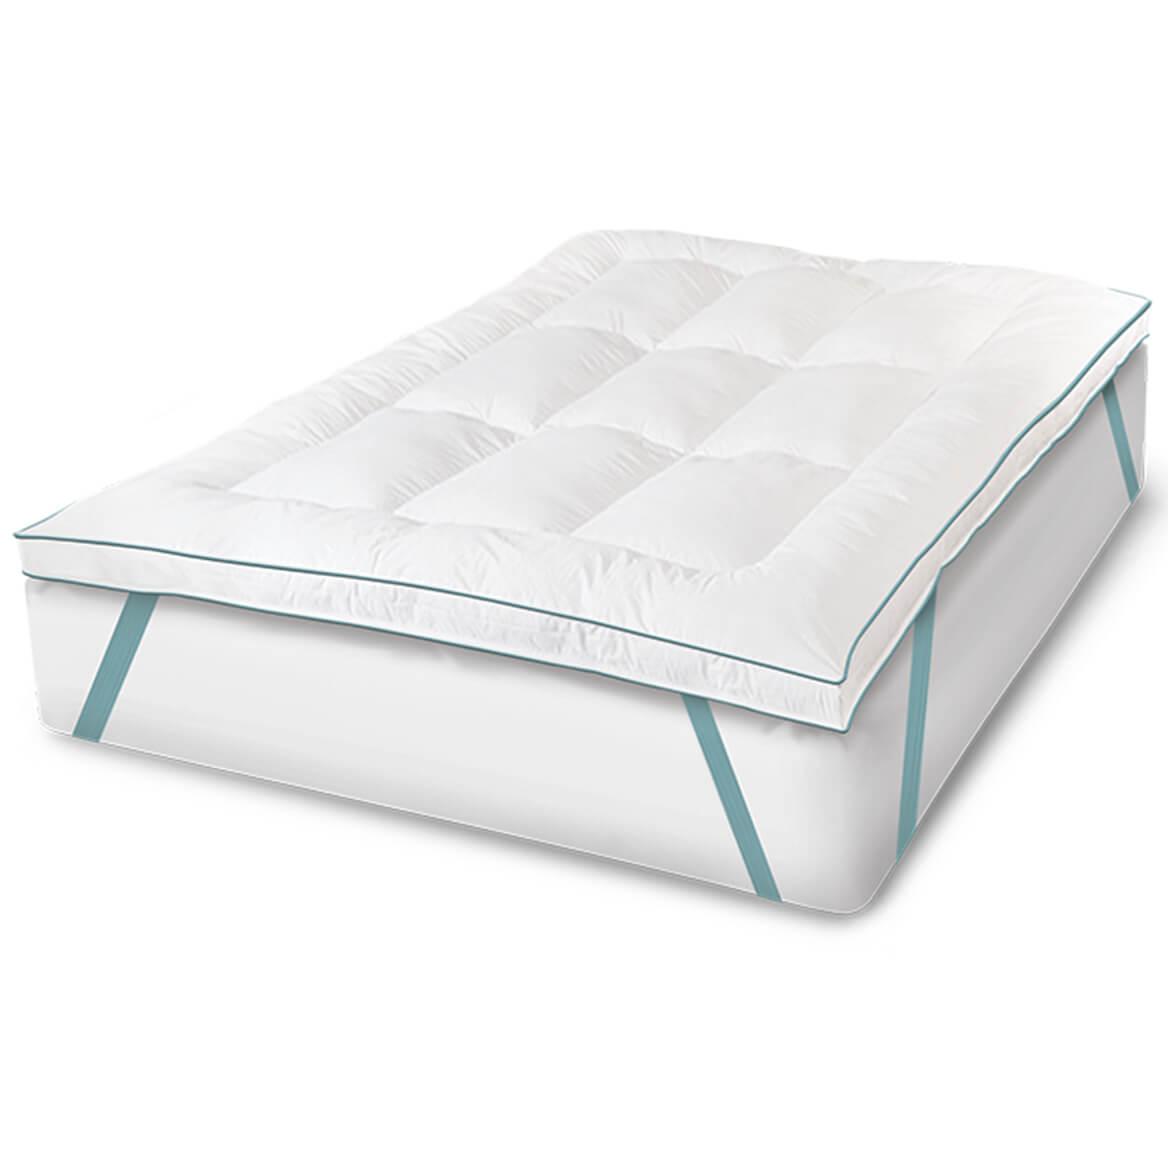 "Soft-Tex™ 2.5"" Memory Foam and Fiber Bed Mattress Topper-350082"